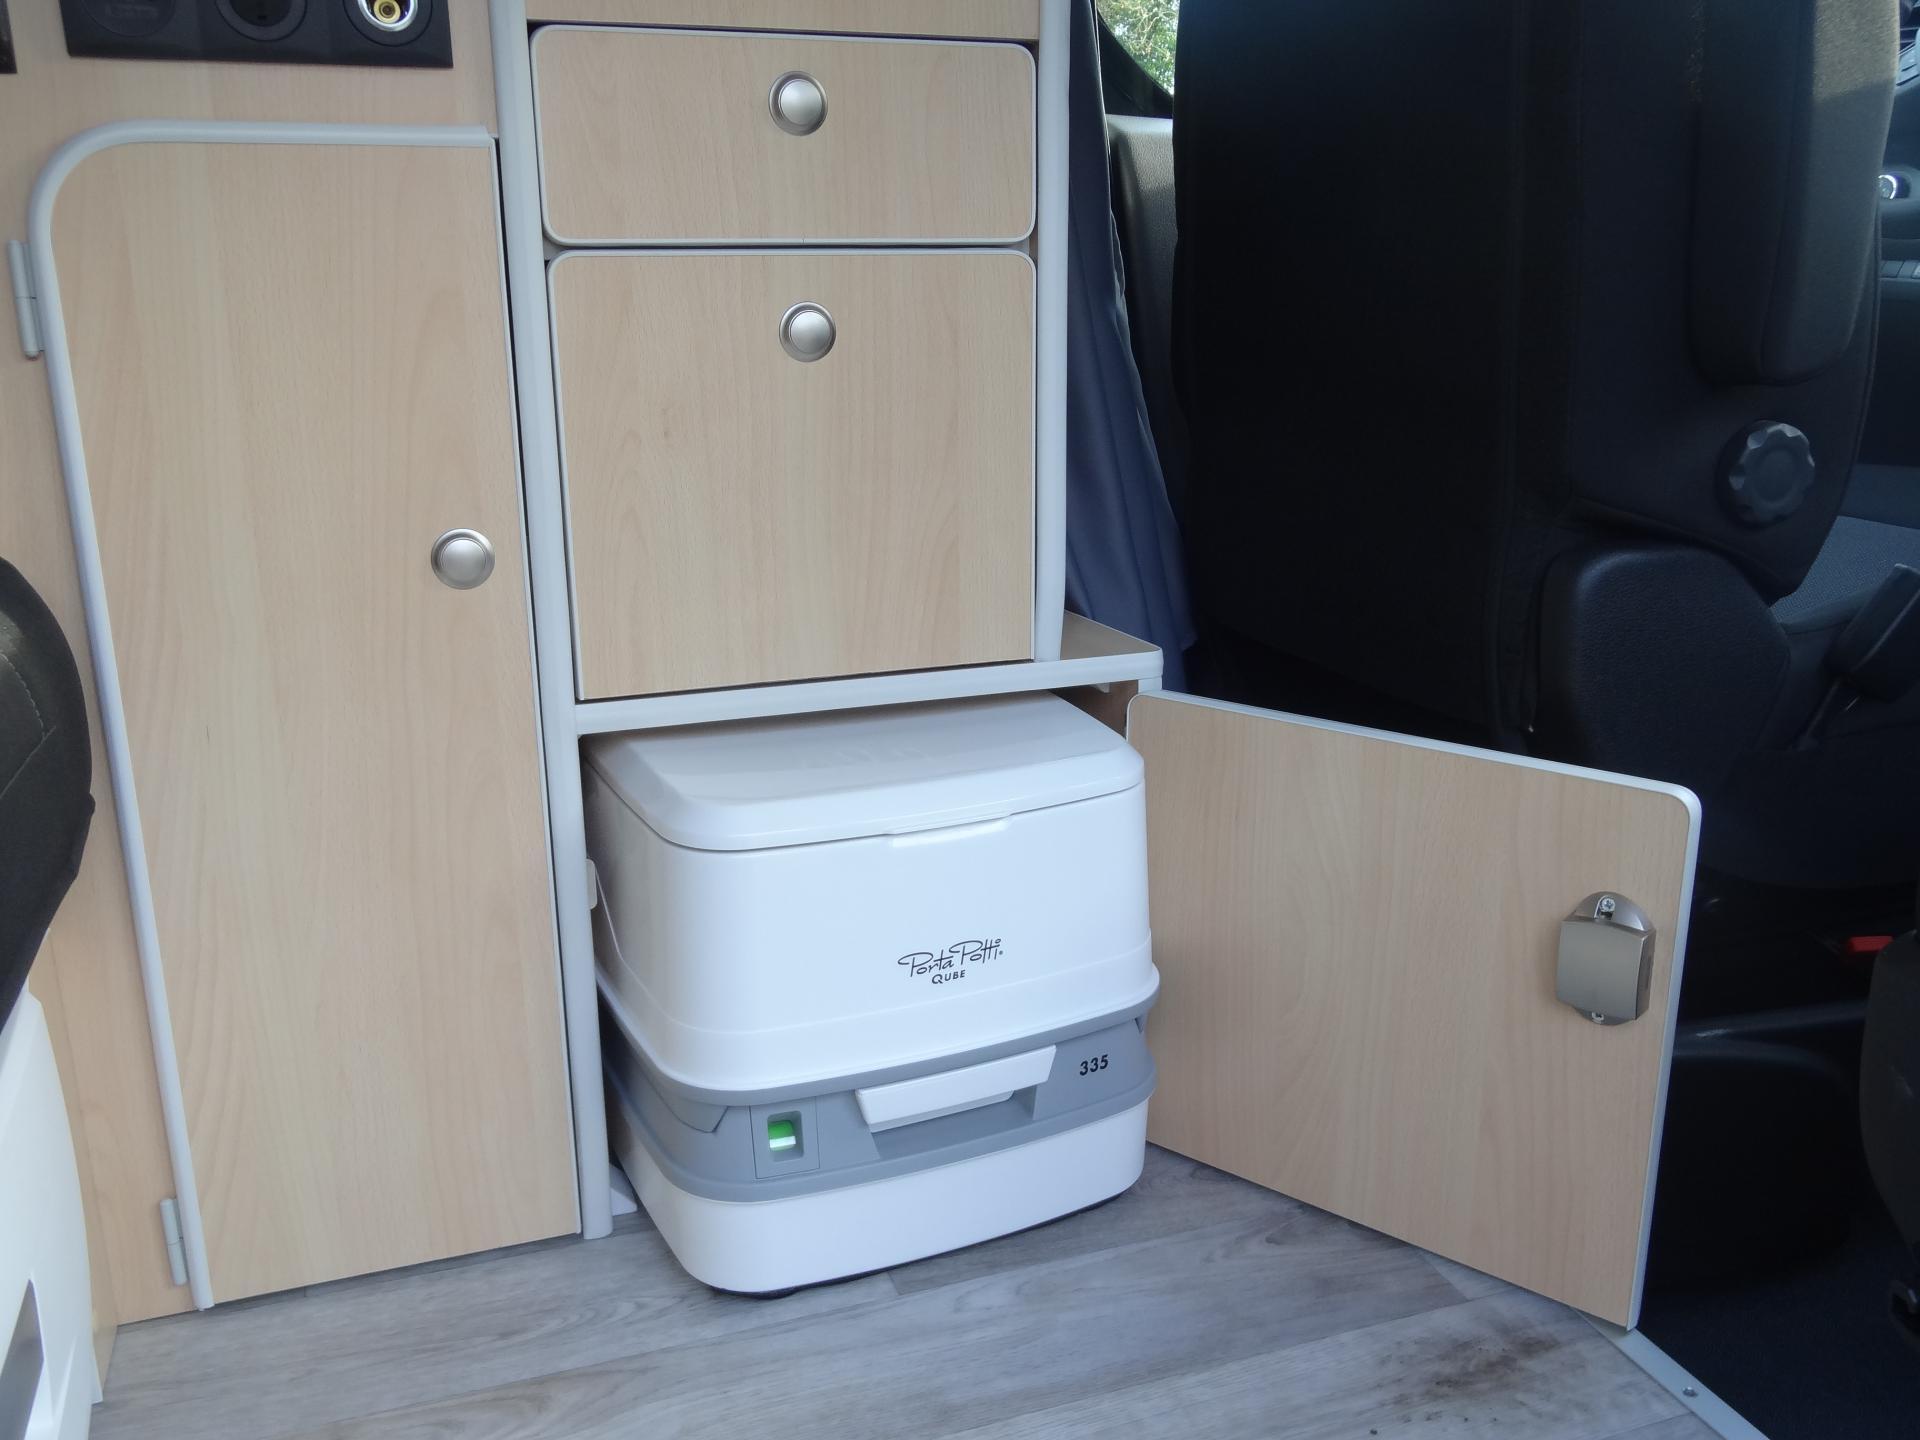 peugeot expert compact 4 60m. Black Bedroom Furniture Sets. Home Design Ideas